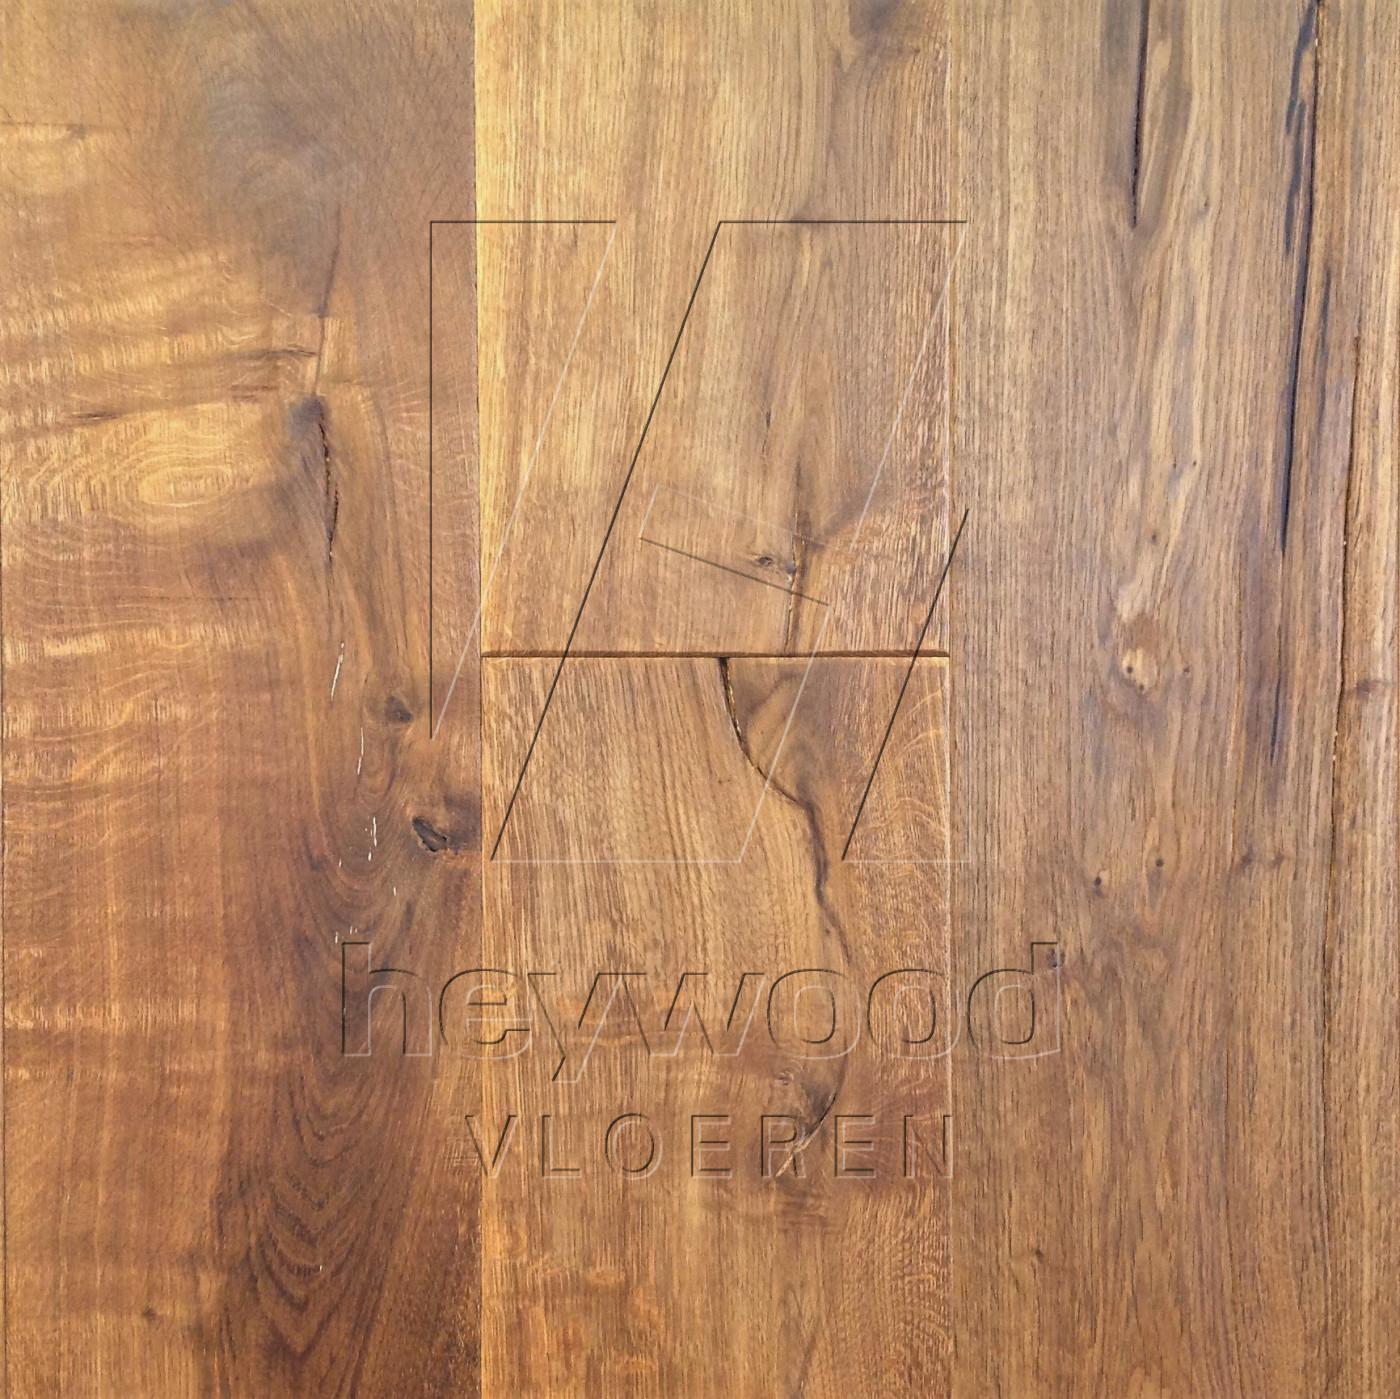 Antique Plank 'Kilimanjaro' in Aged Antique Surface of Aged Hardwood Floors